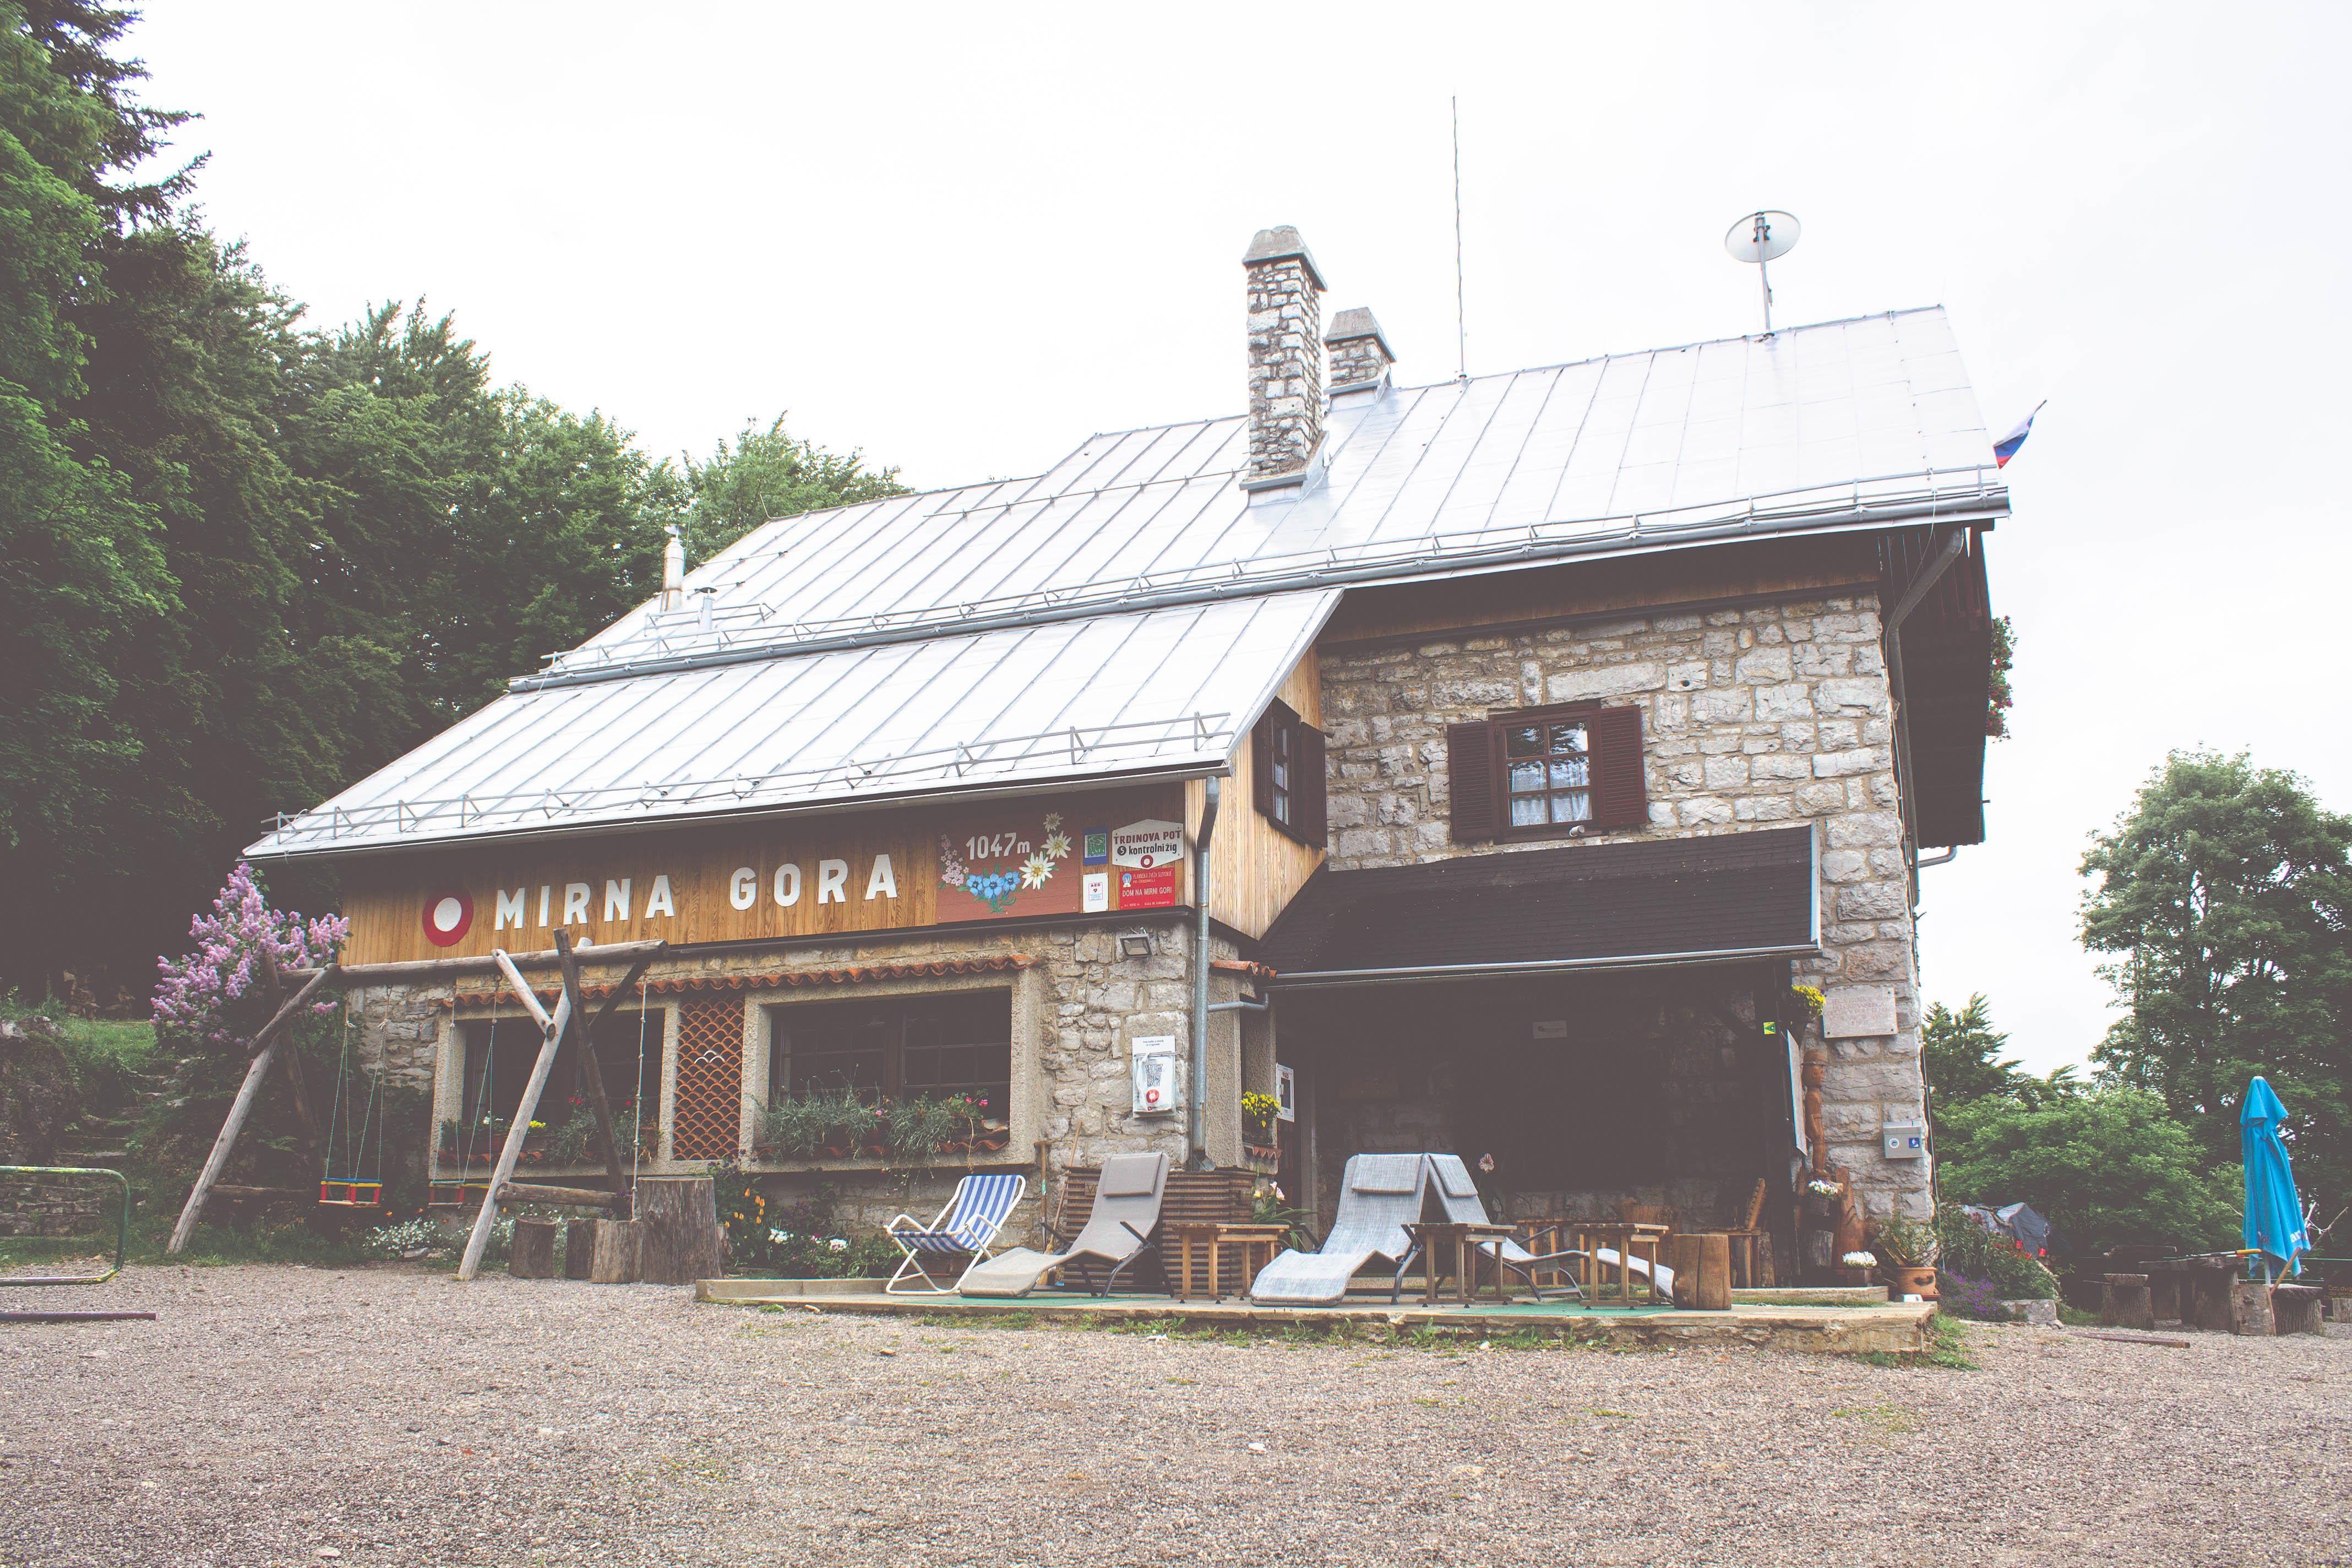 Mirna Gora hike, slovenia